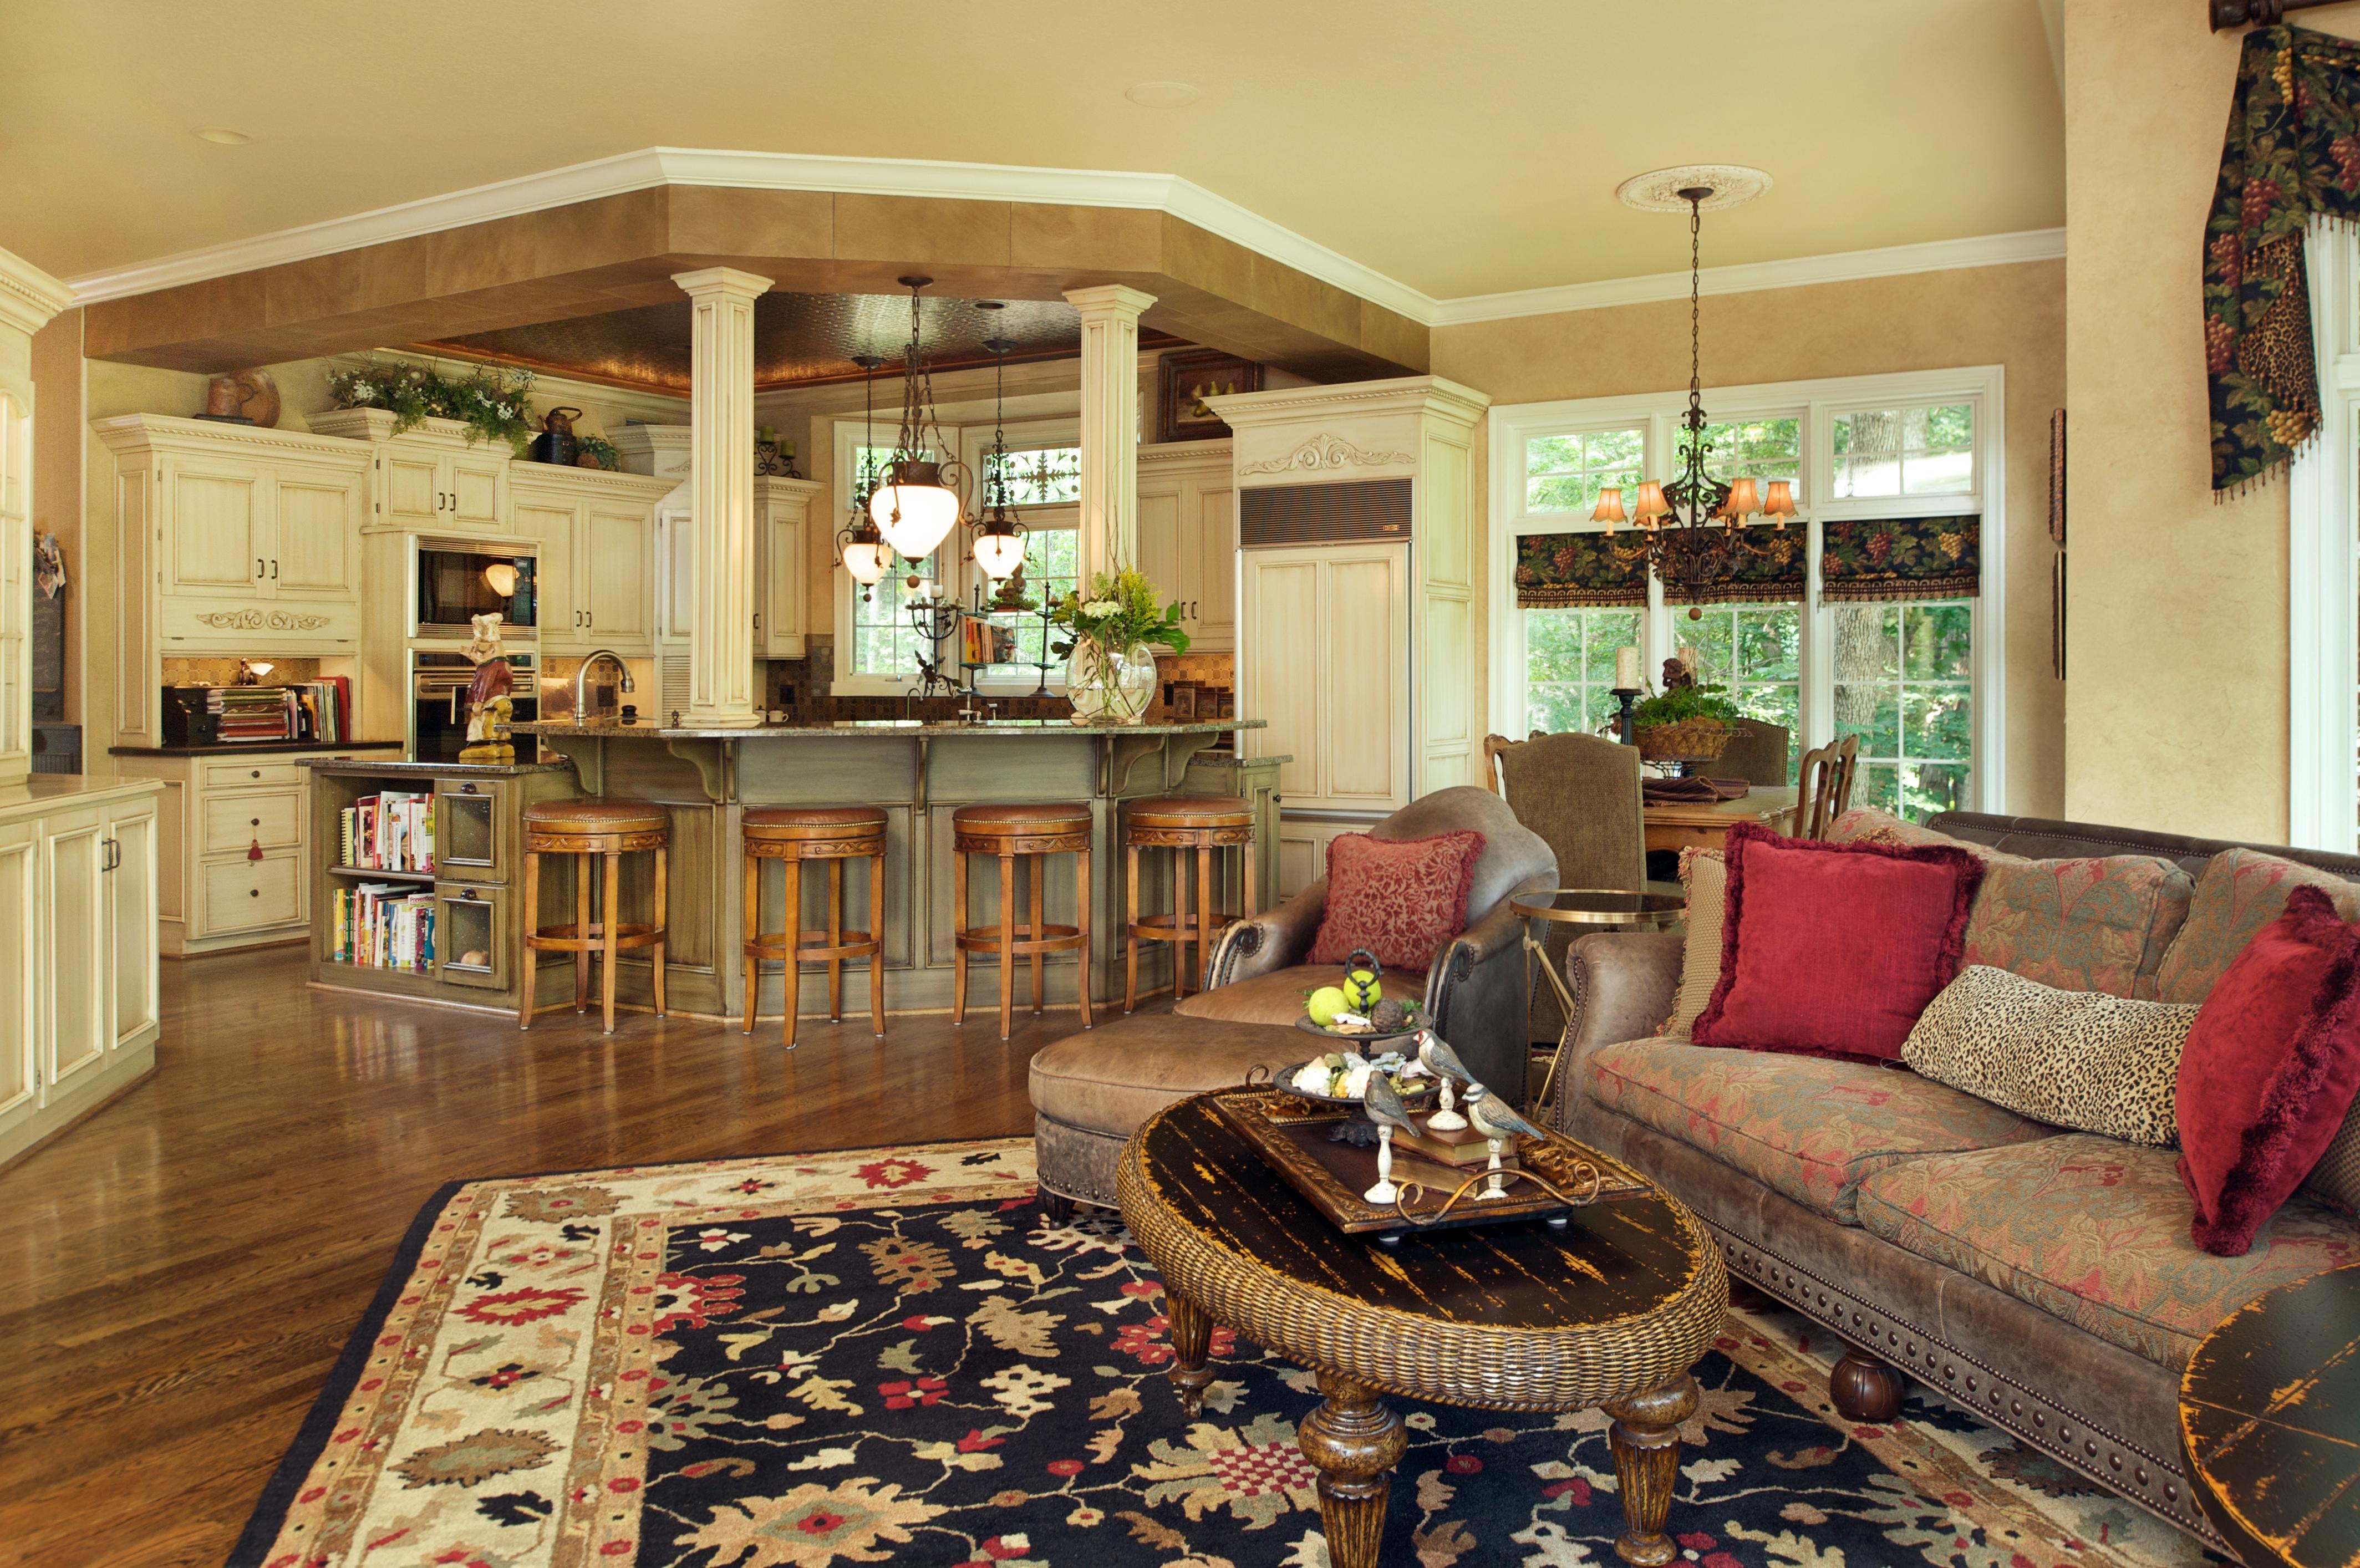 The Decorative Touch Interior Design Kansas City